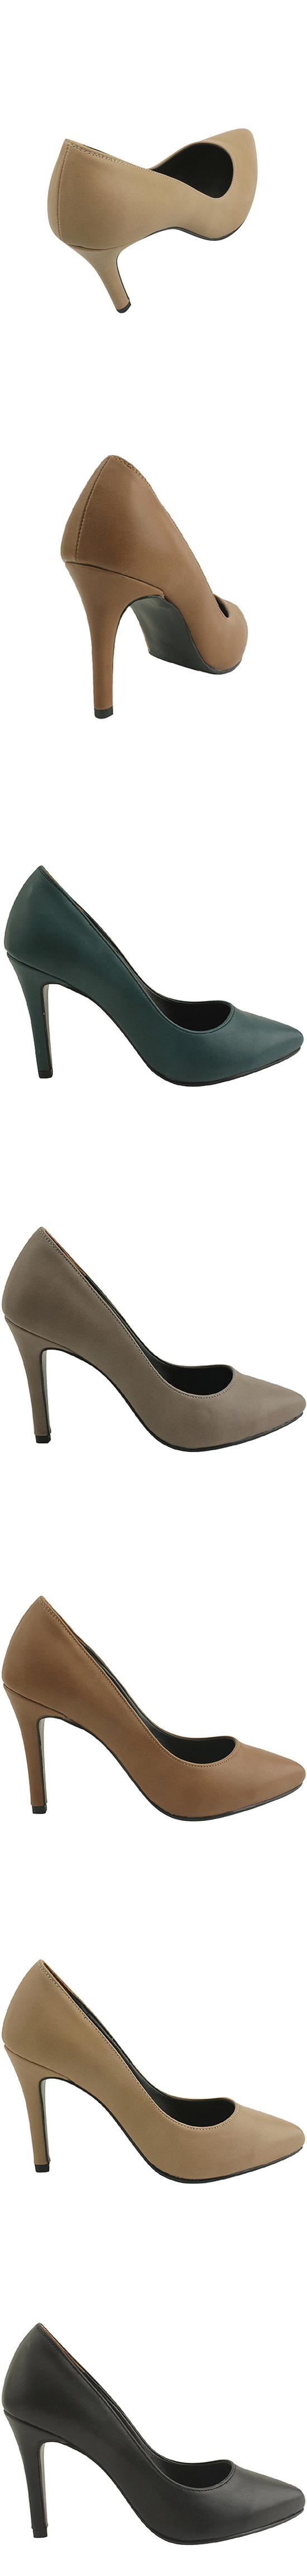 Minimal Stiletto High Heels 9cm Gray